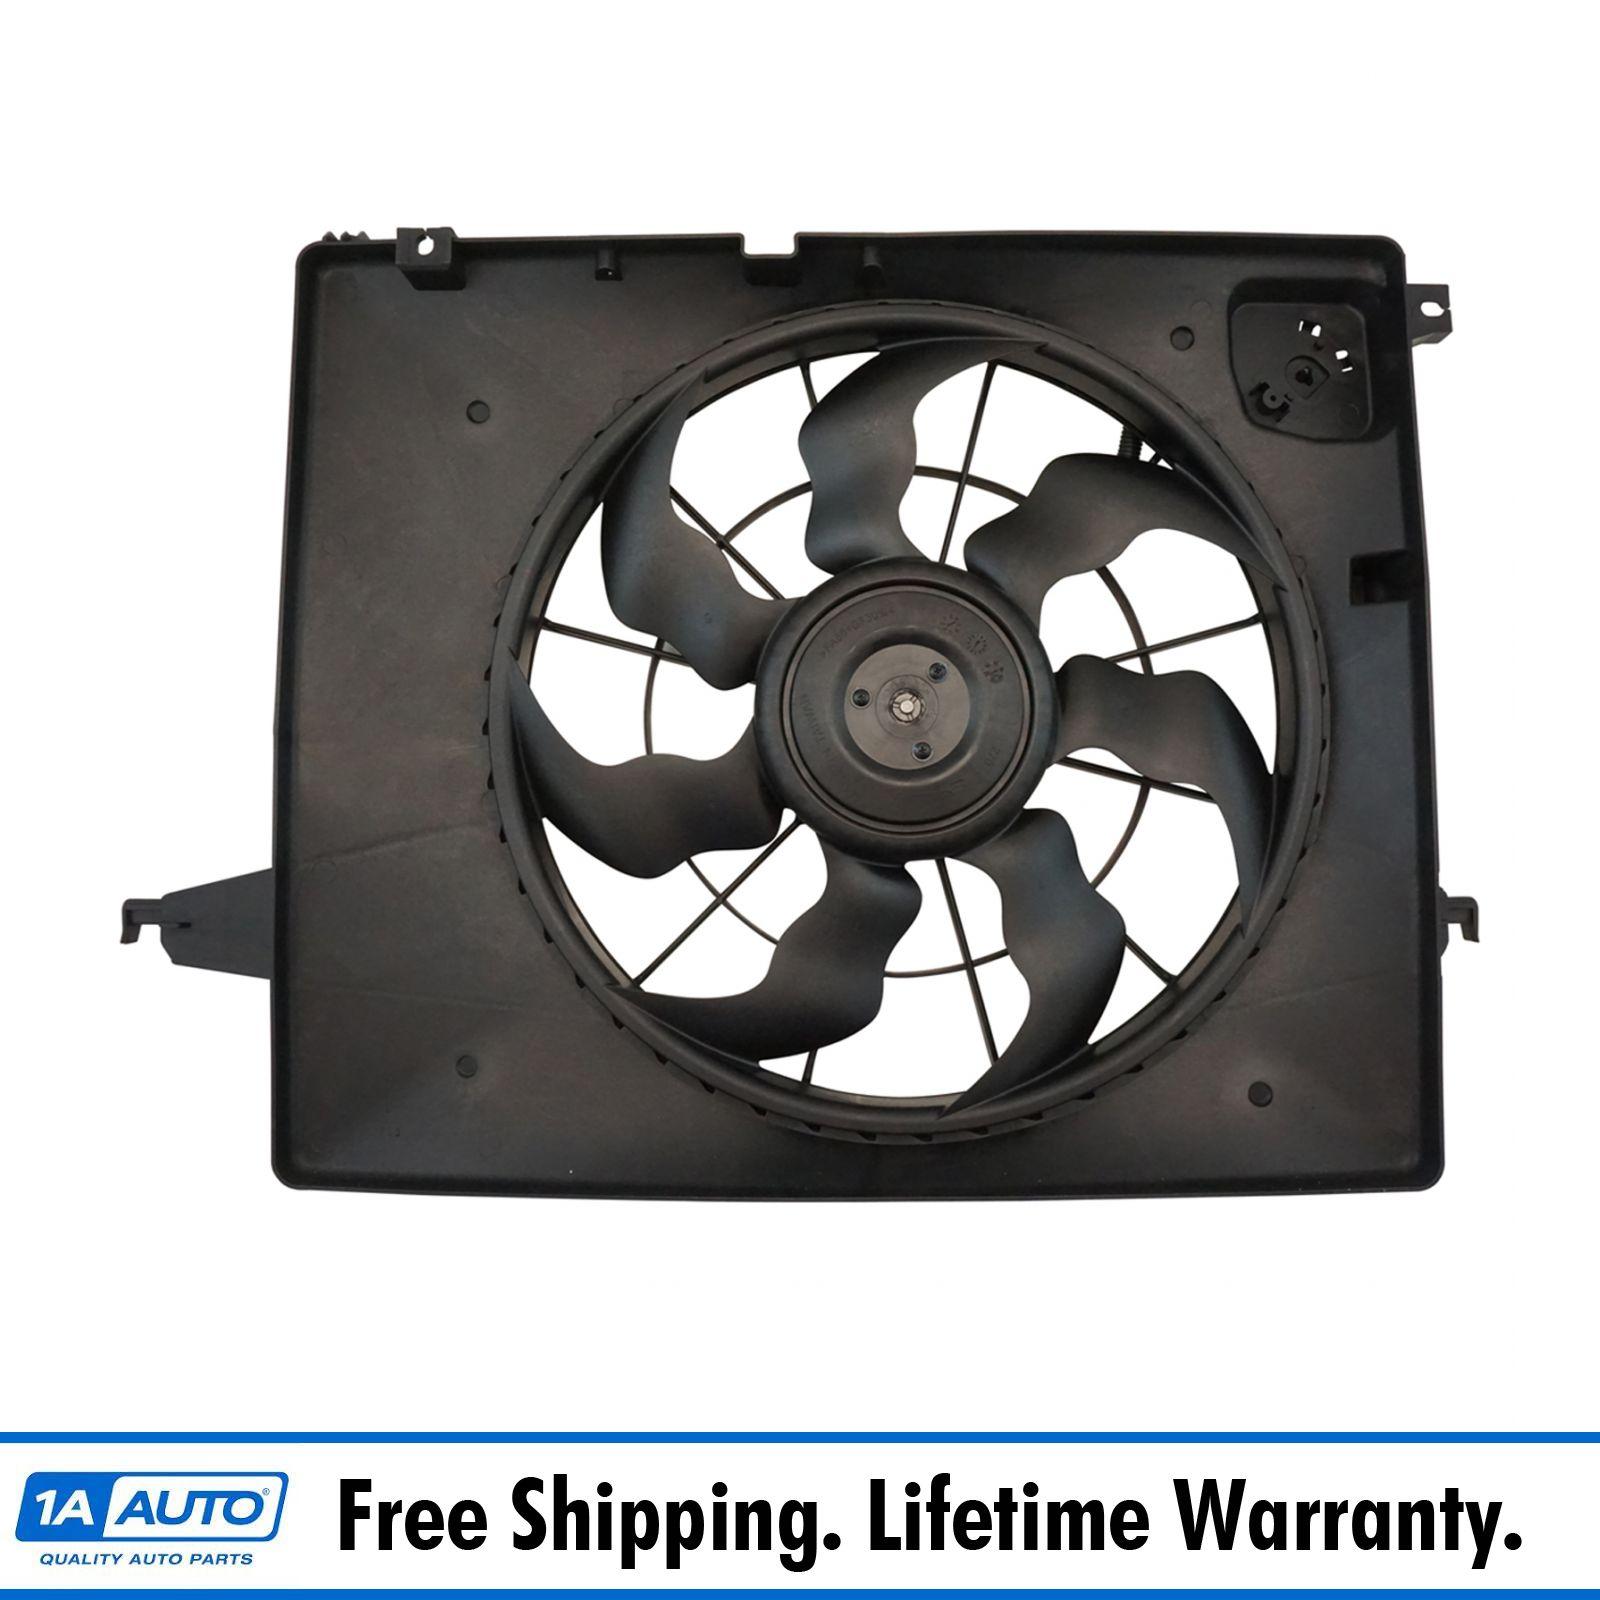 Engine Radiator Dual Cooling Fan Assembly for Kia Sorento Hyundai Sante Fe